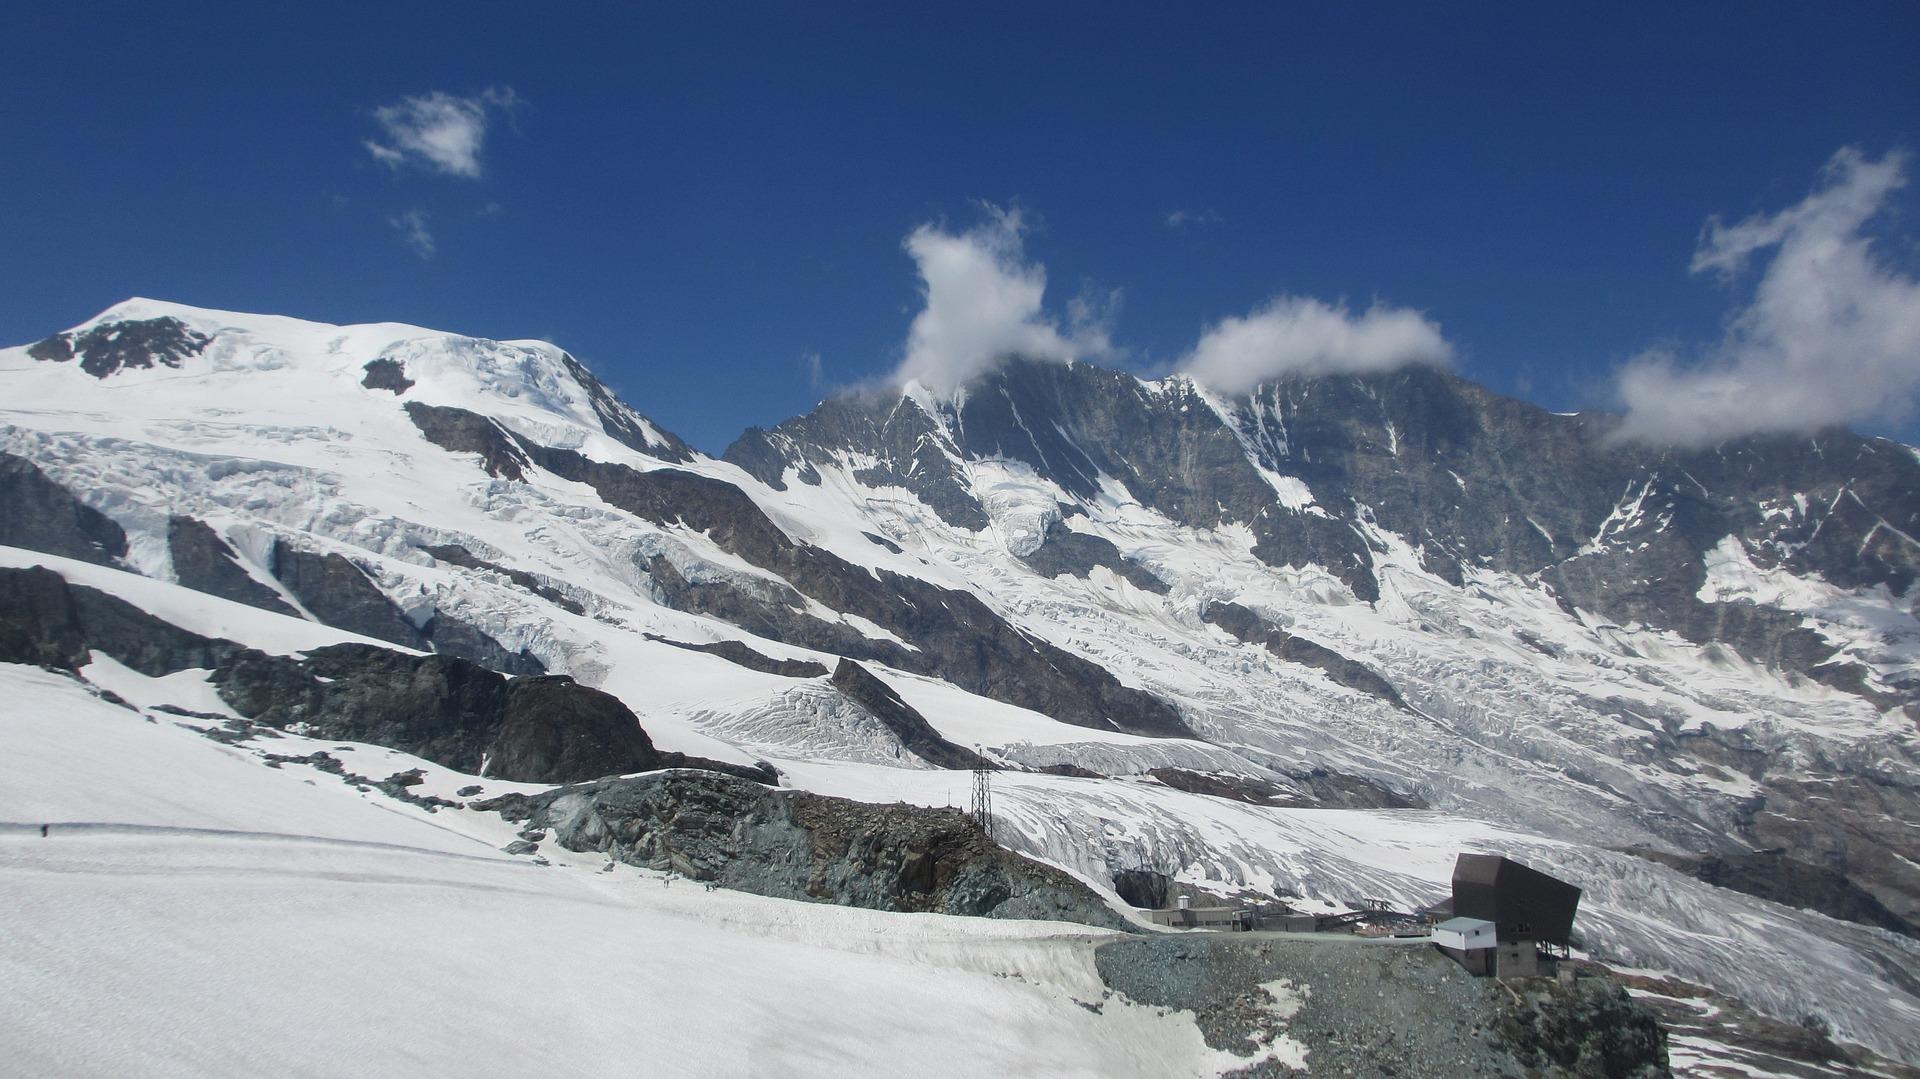 Saas-Fee Switzerland Ski Resort